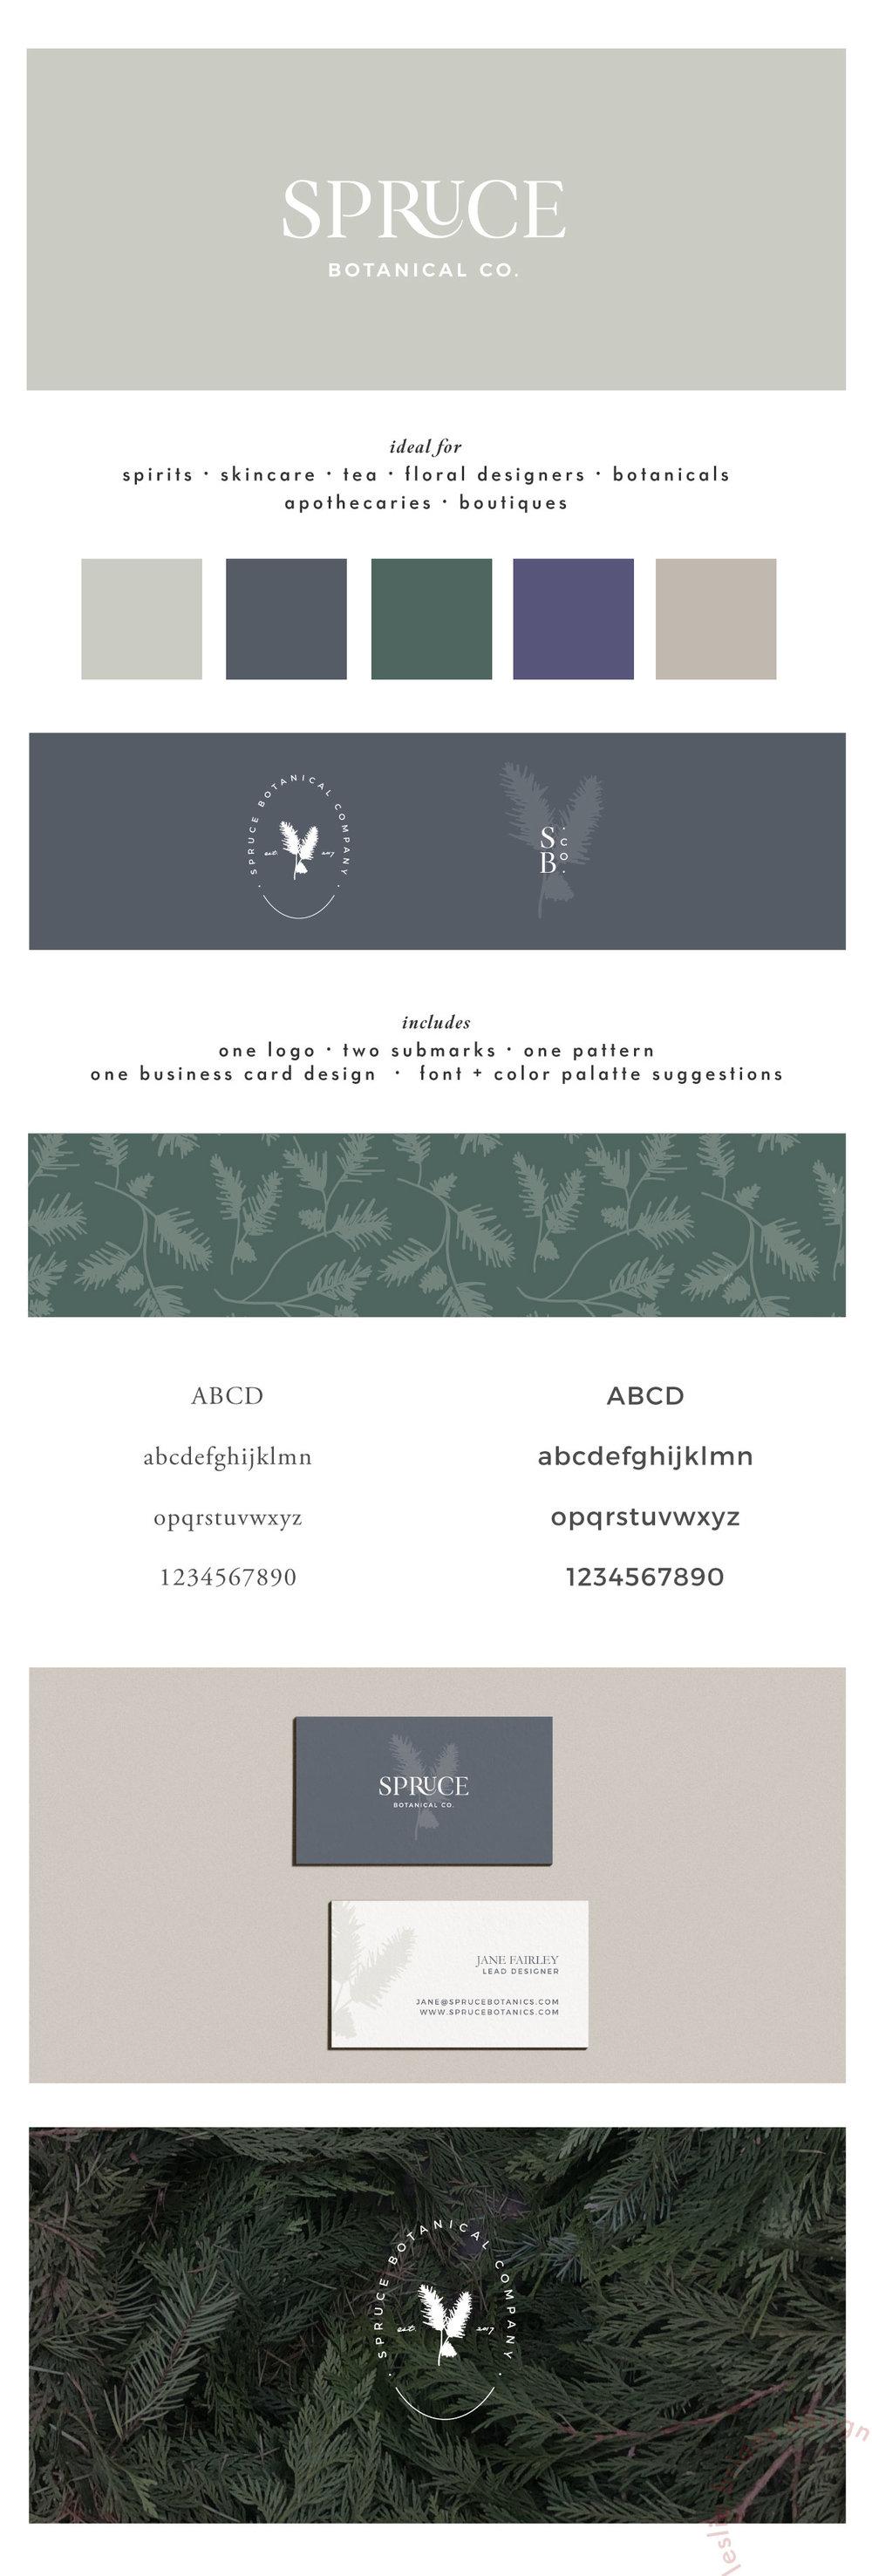 spruce-layout.jpg